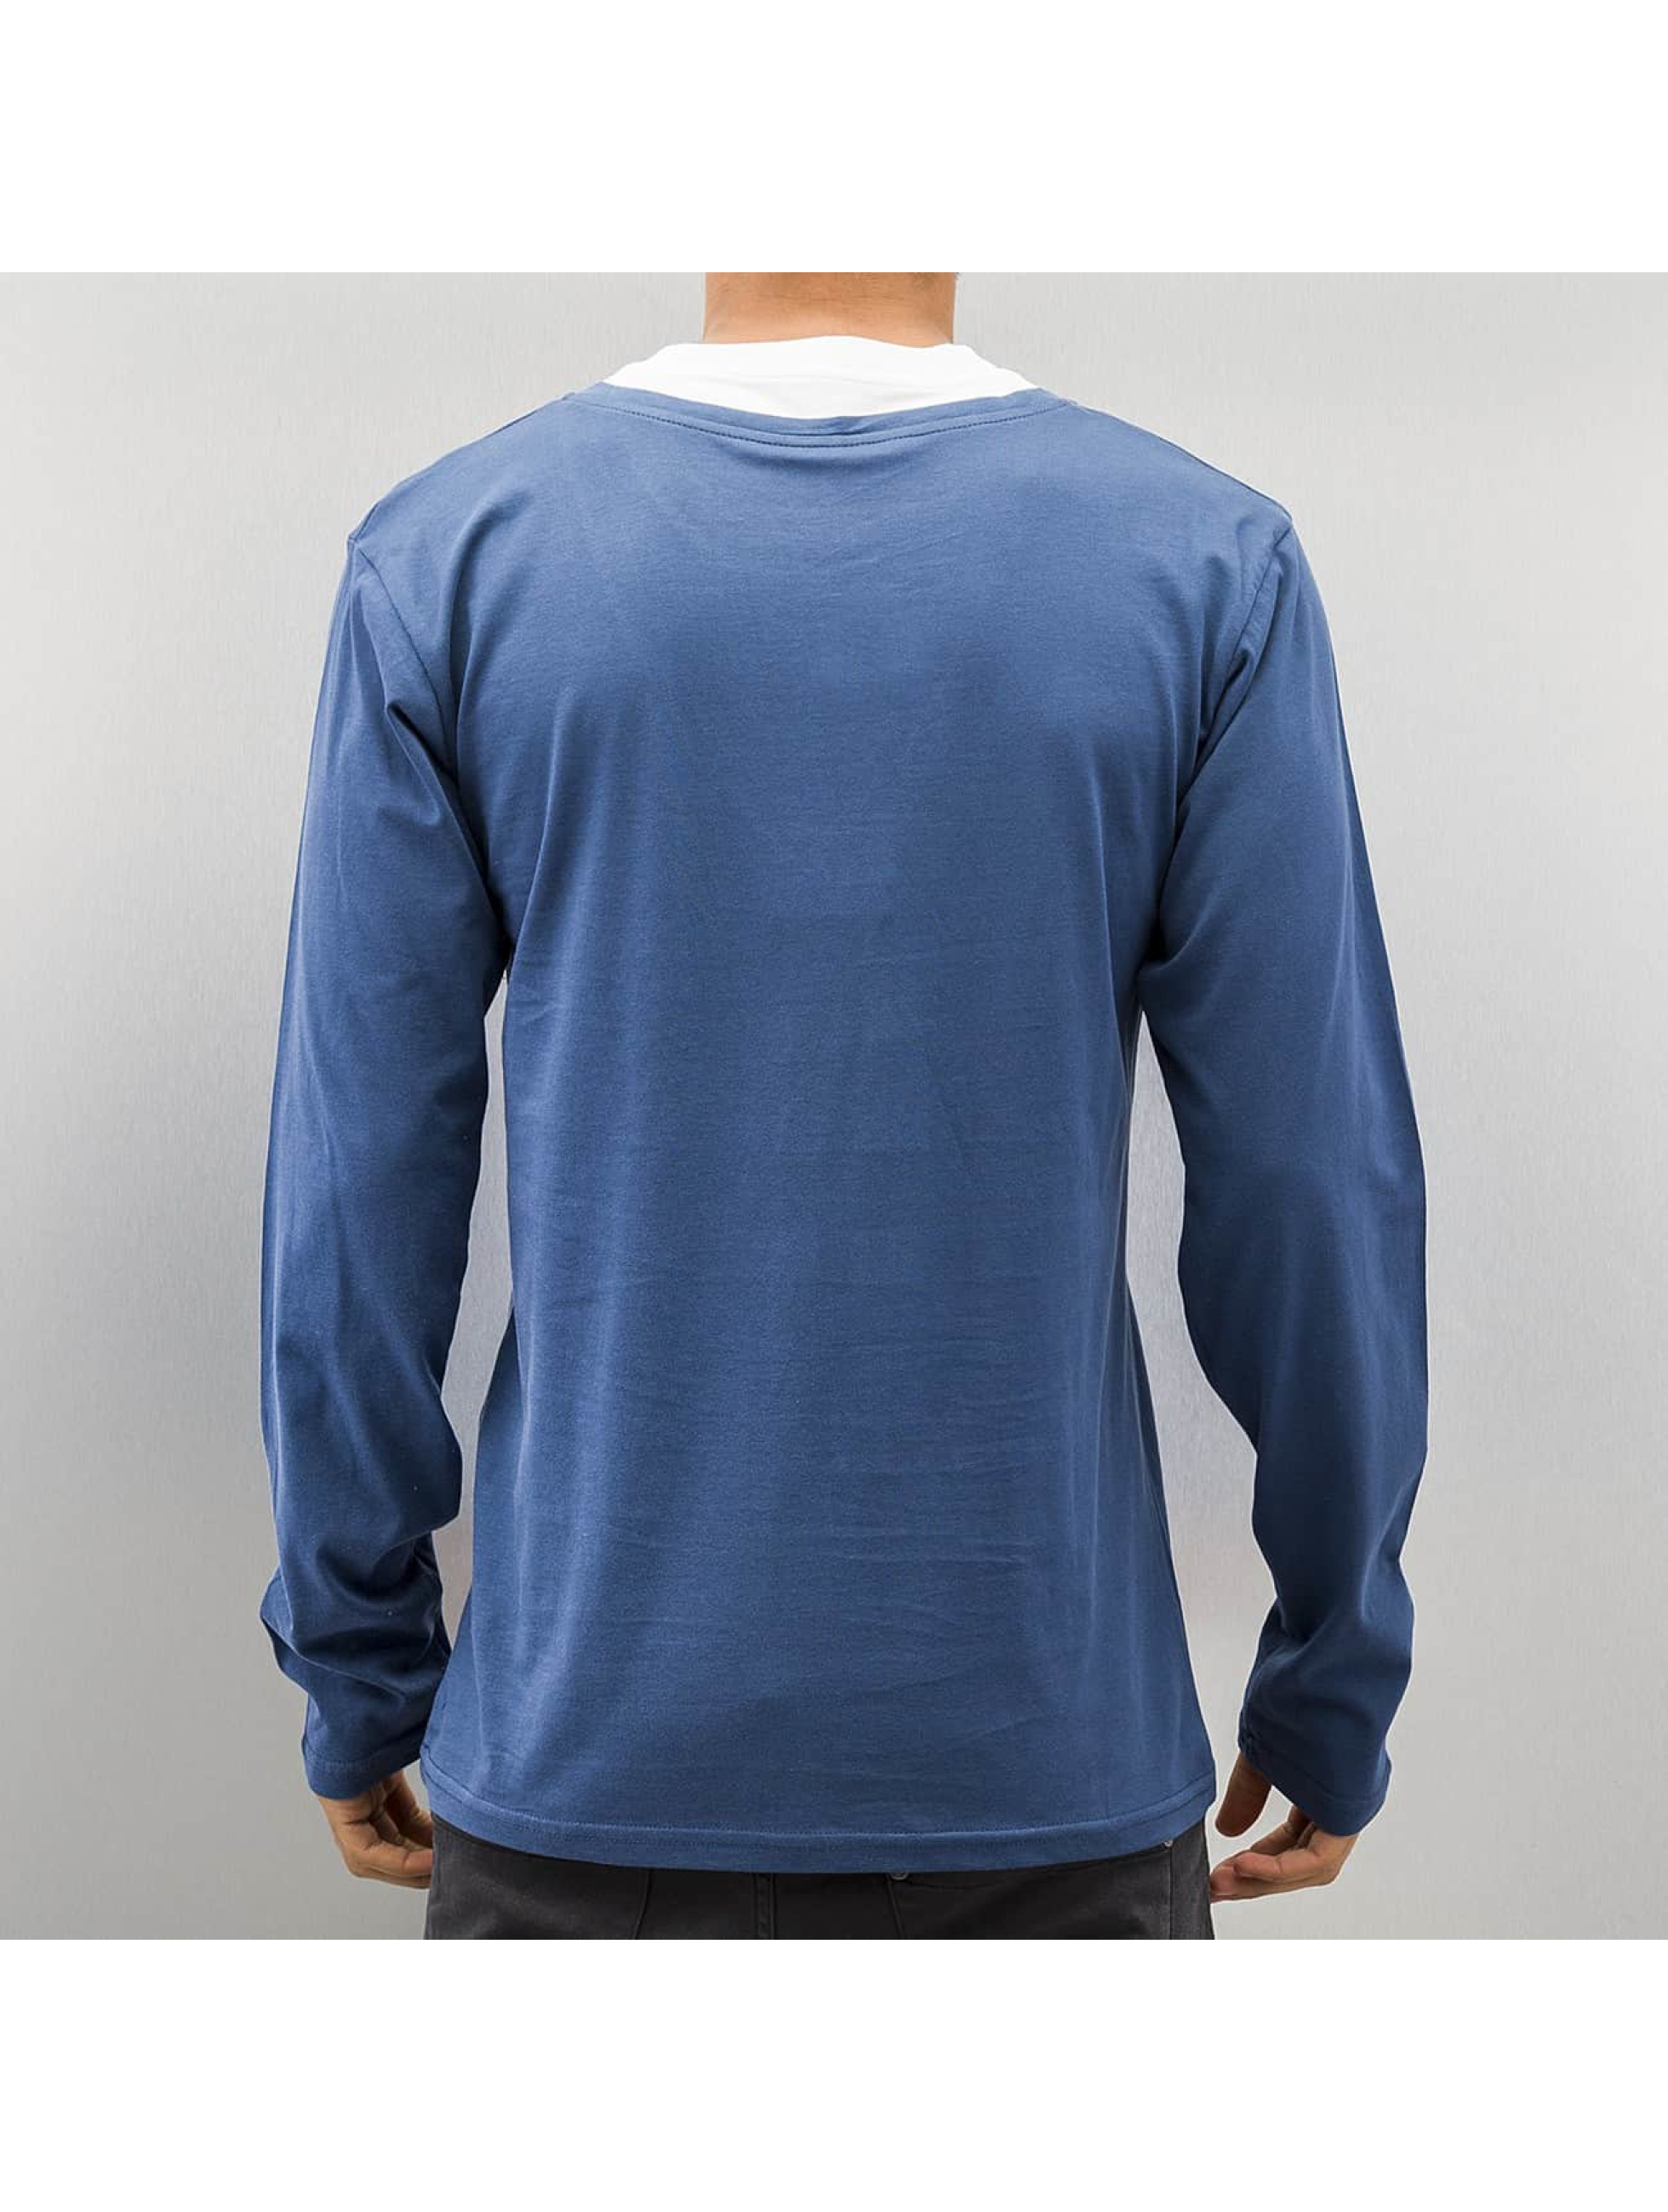 Cazzy Clang Longsleeve Breast Pocket blau